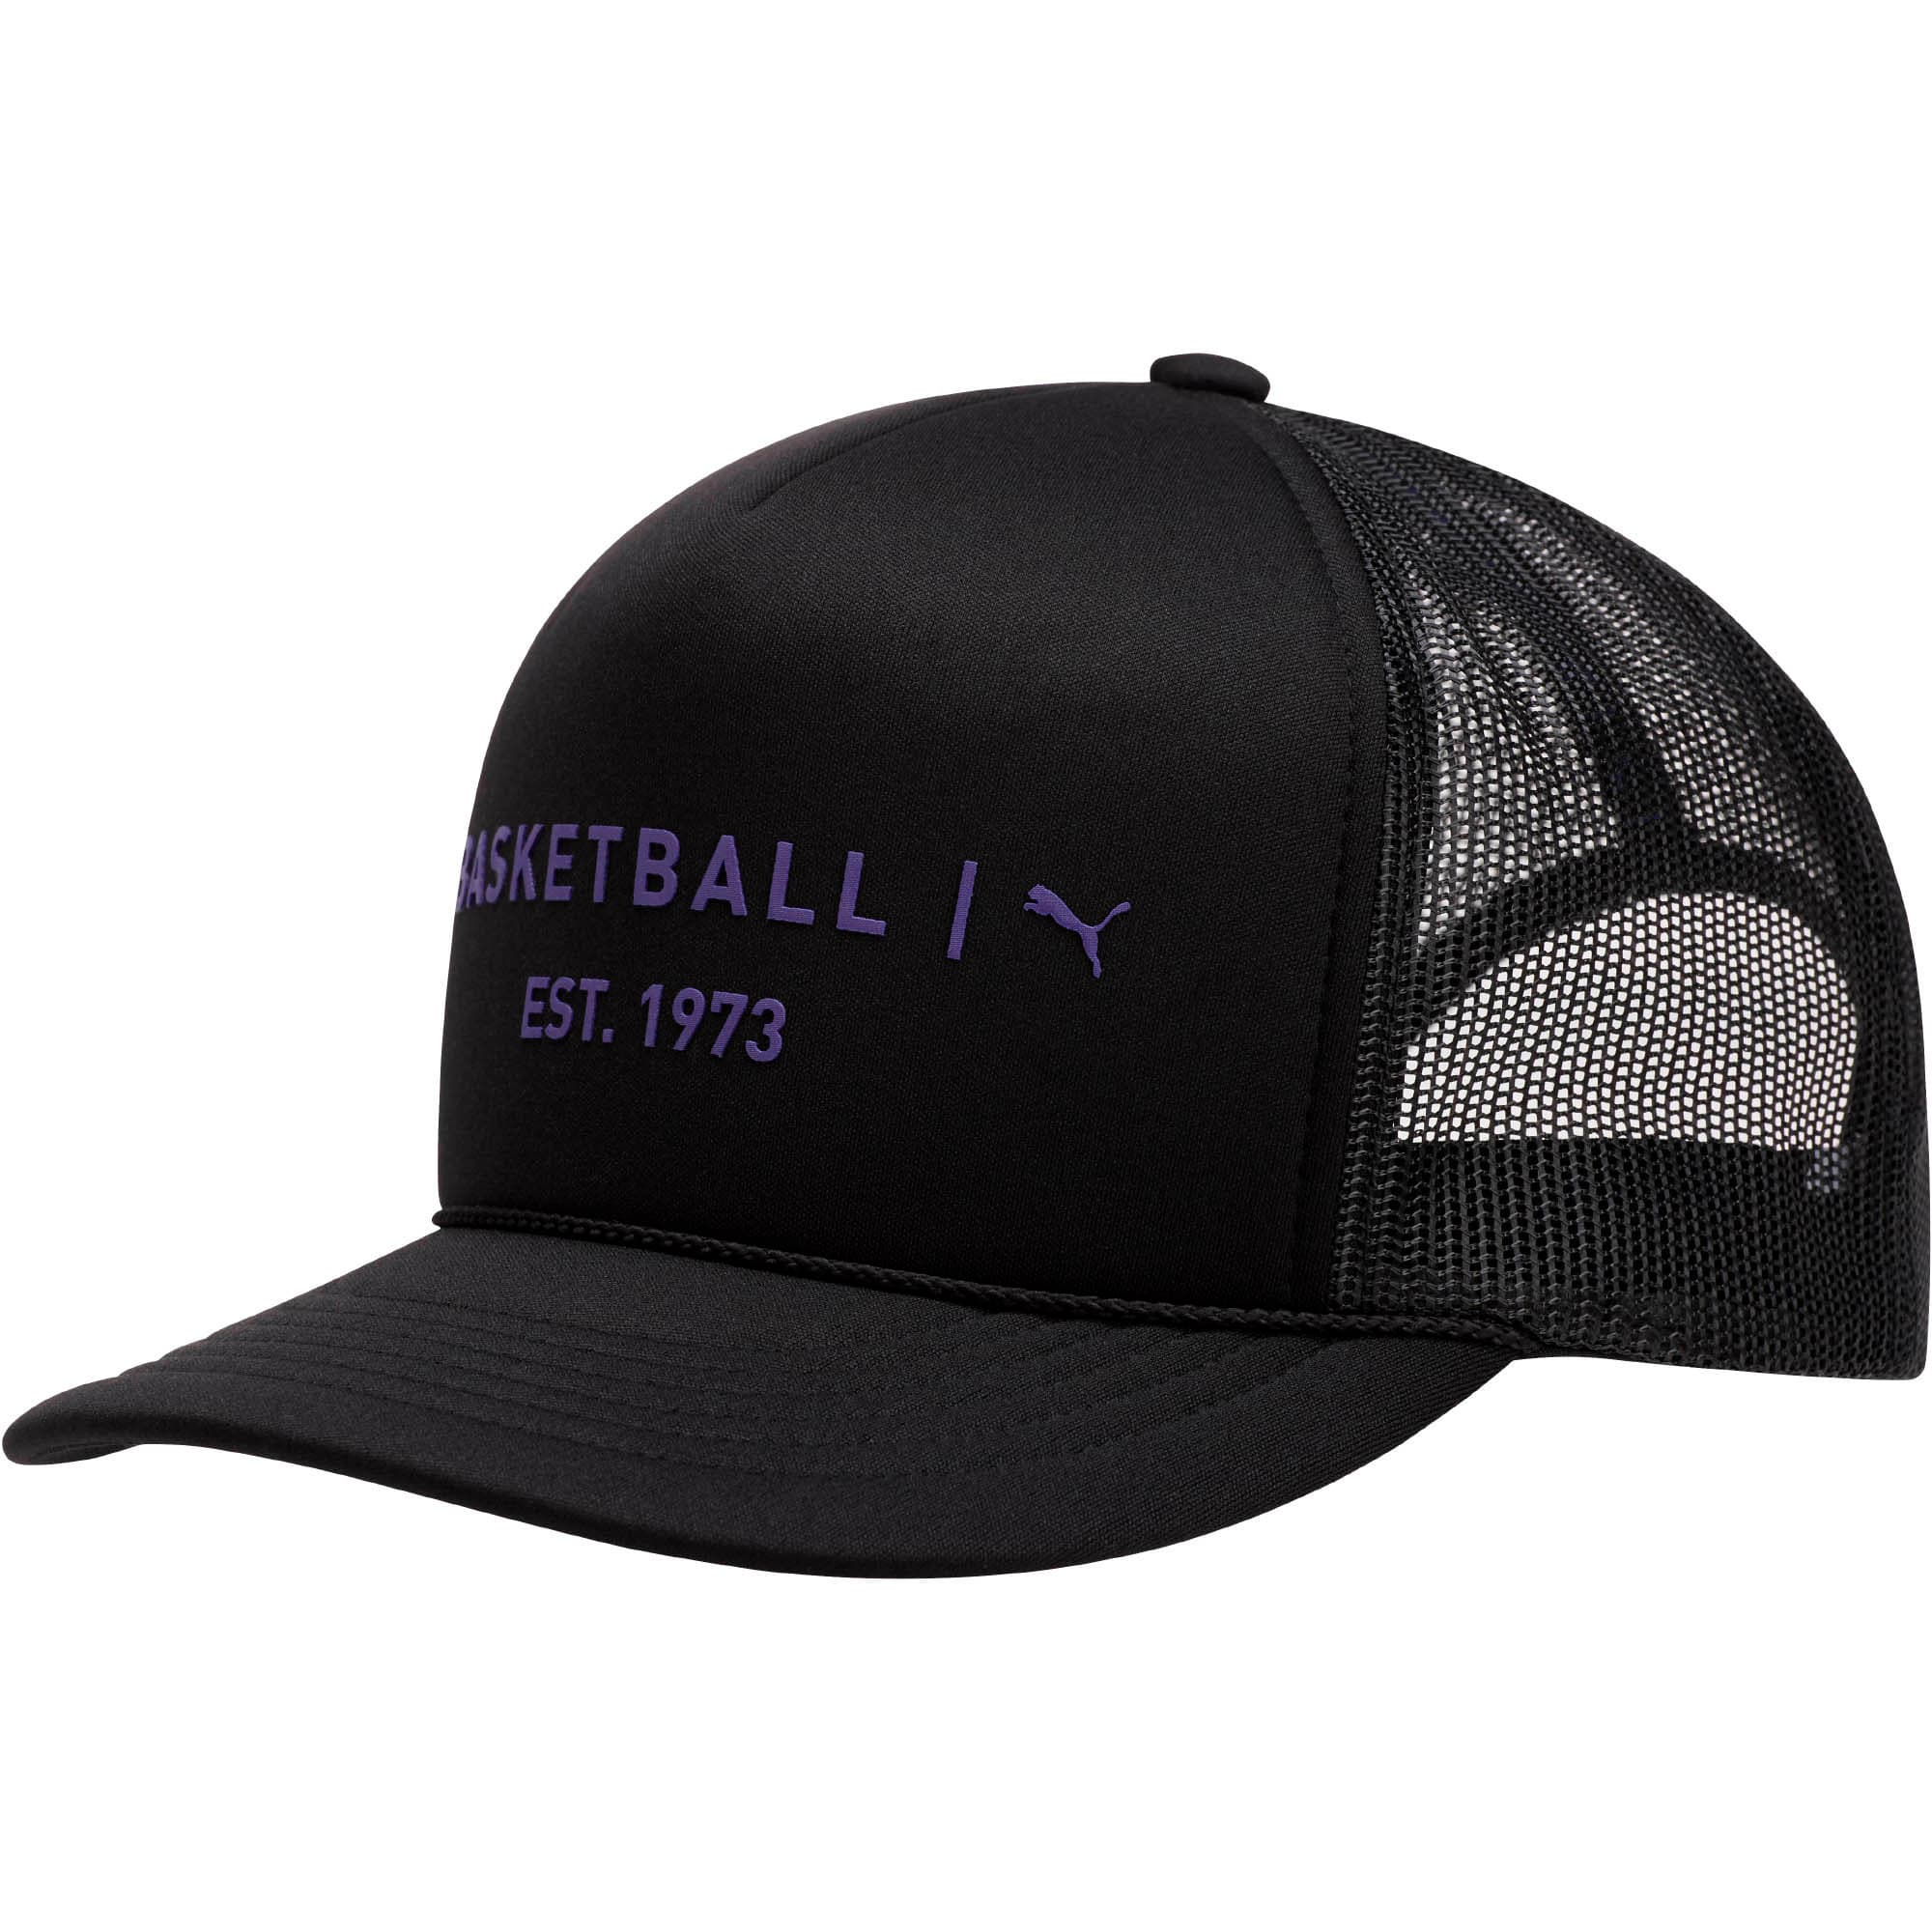 Thumbnail 1 of Core Mesh Trucker Hat, BLACK / PURPLE, medium